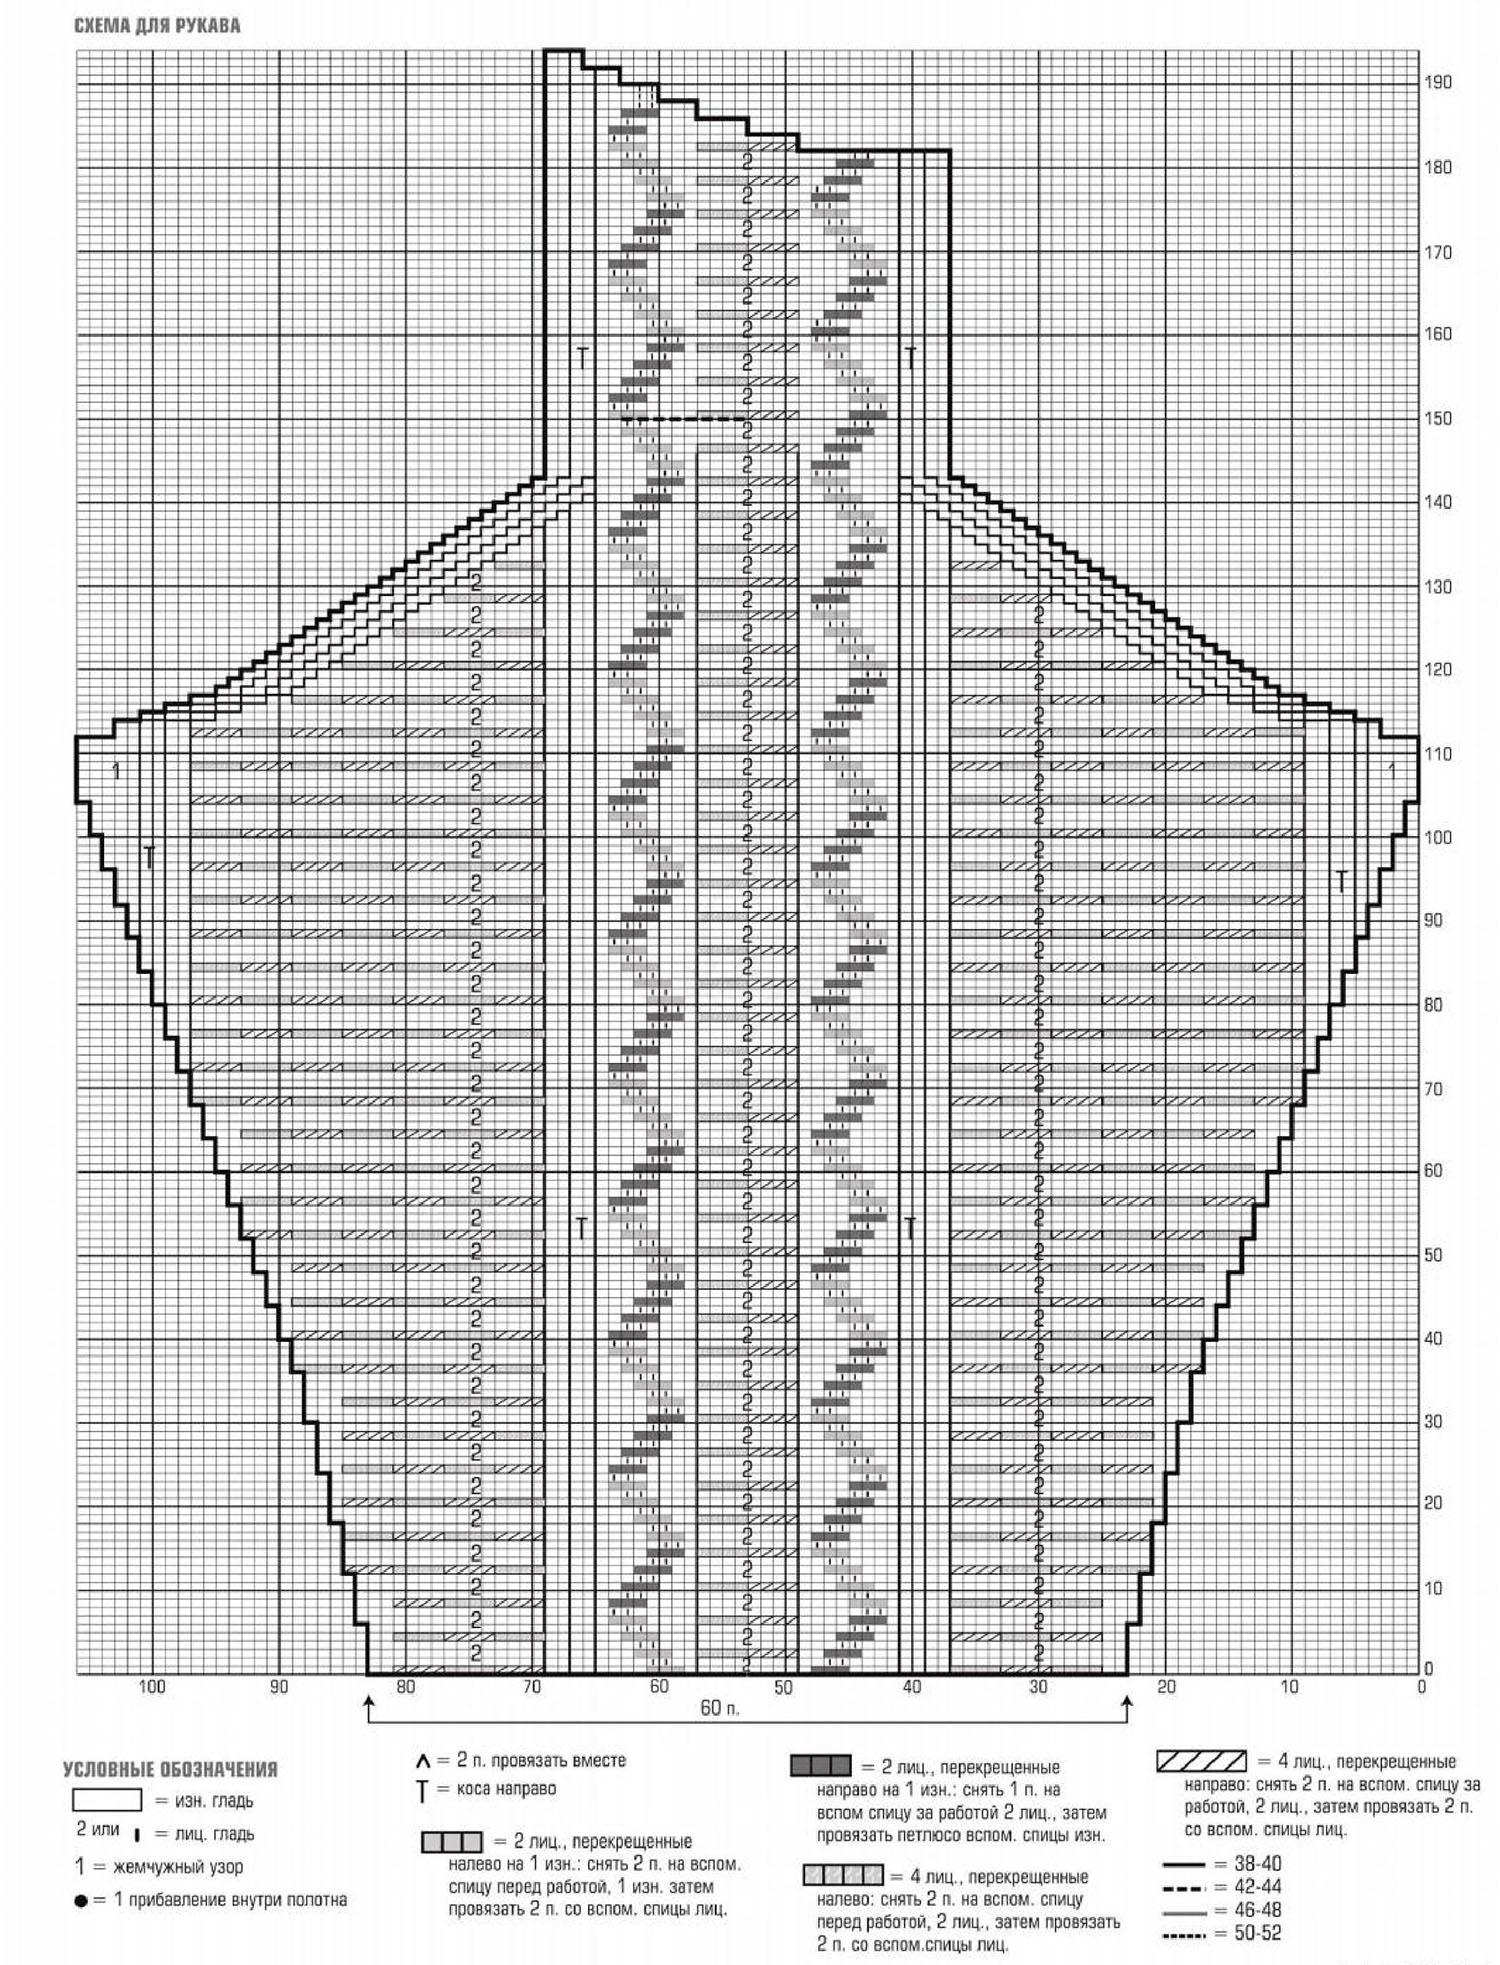 Пуловер спицами с узором из кос и аранов схема рукава